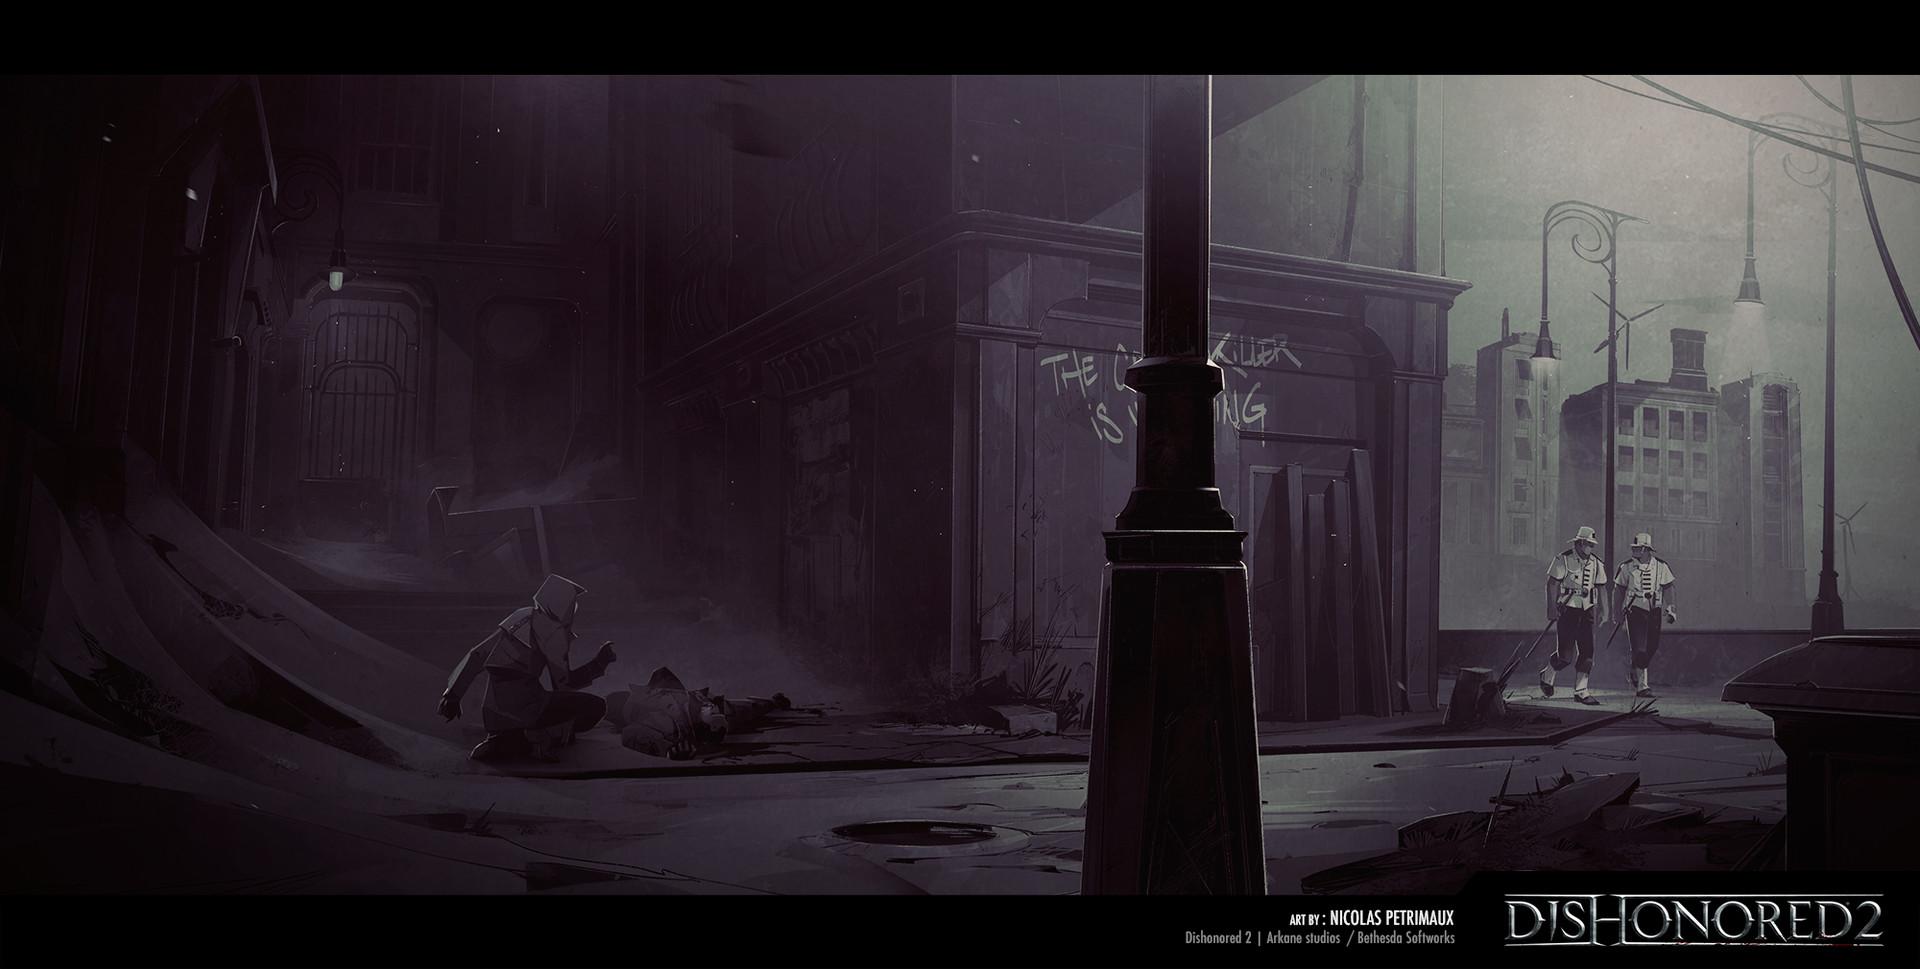 Nicolas petrimaux templatecredit dishonored2 eow corvo3